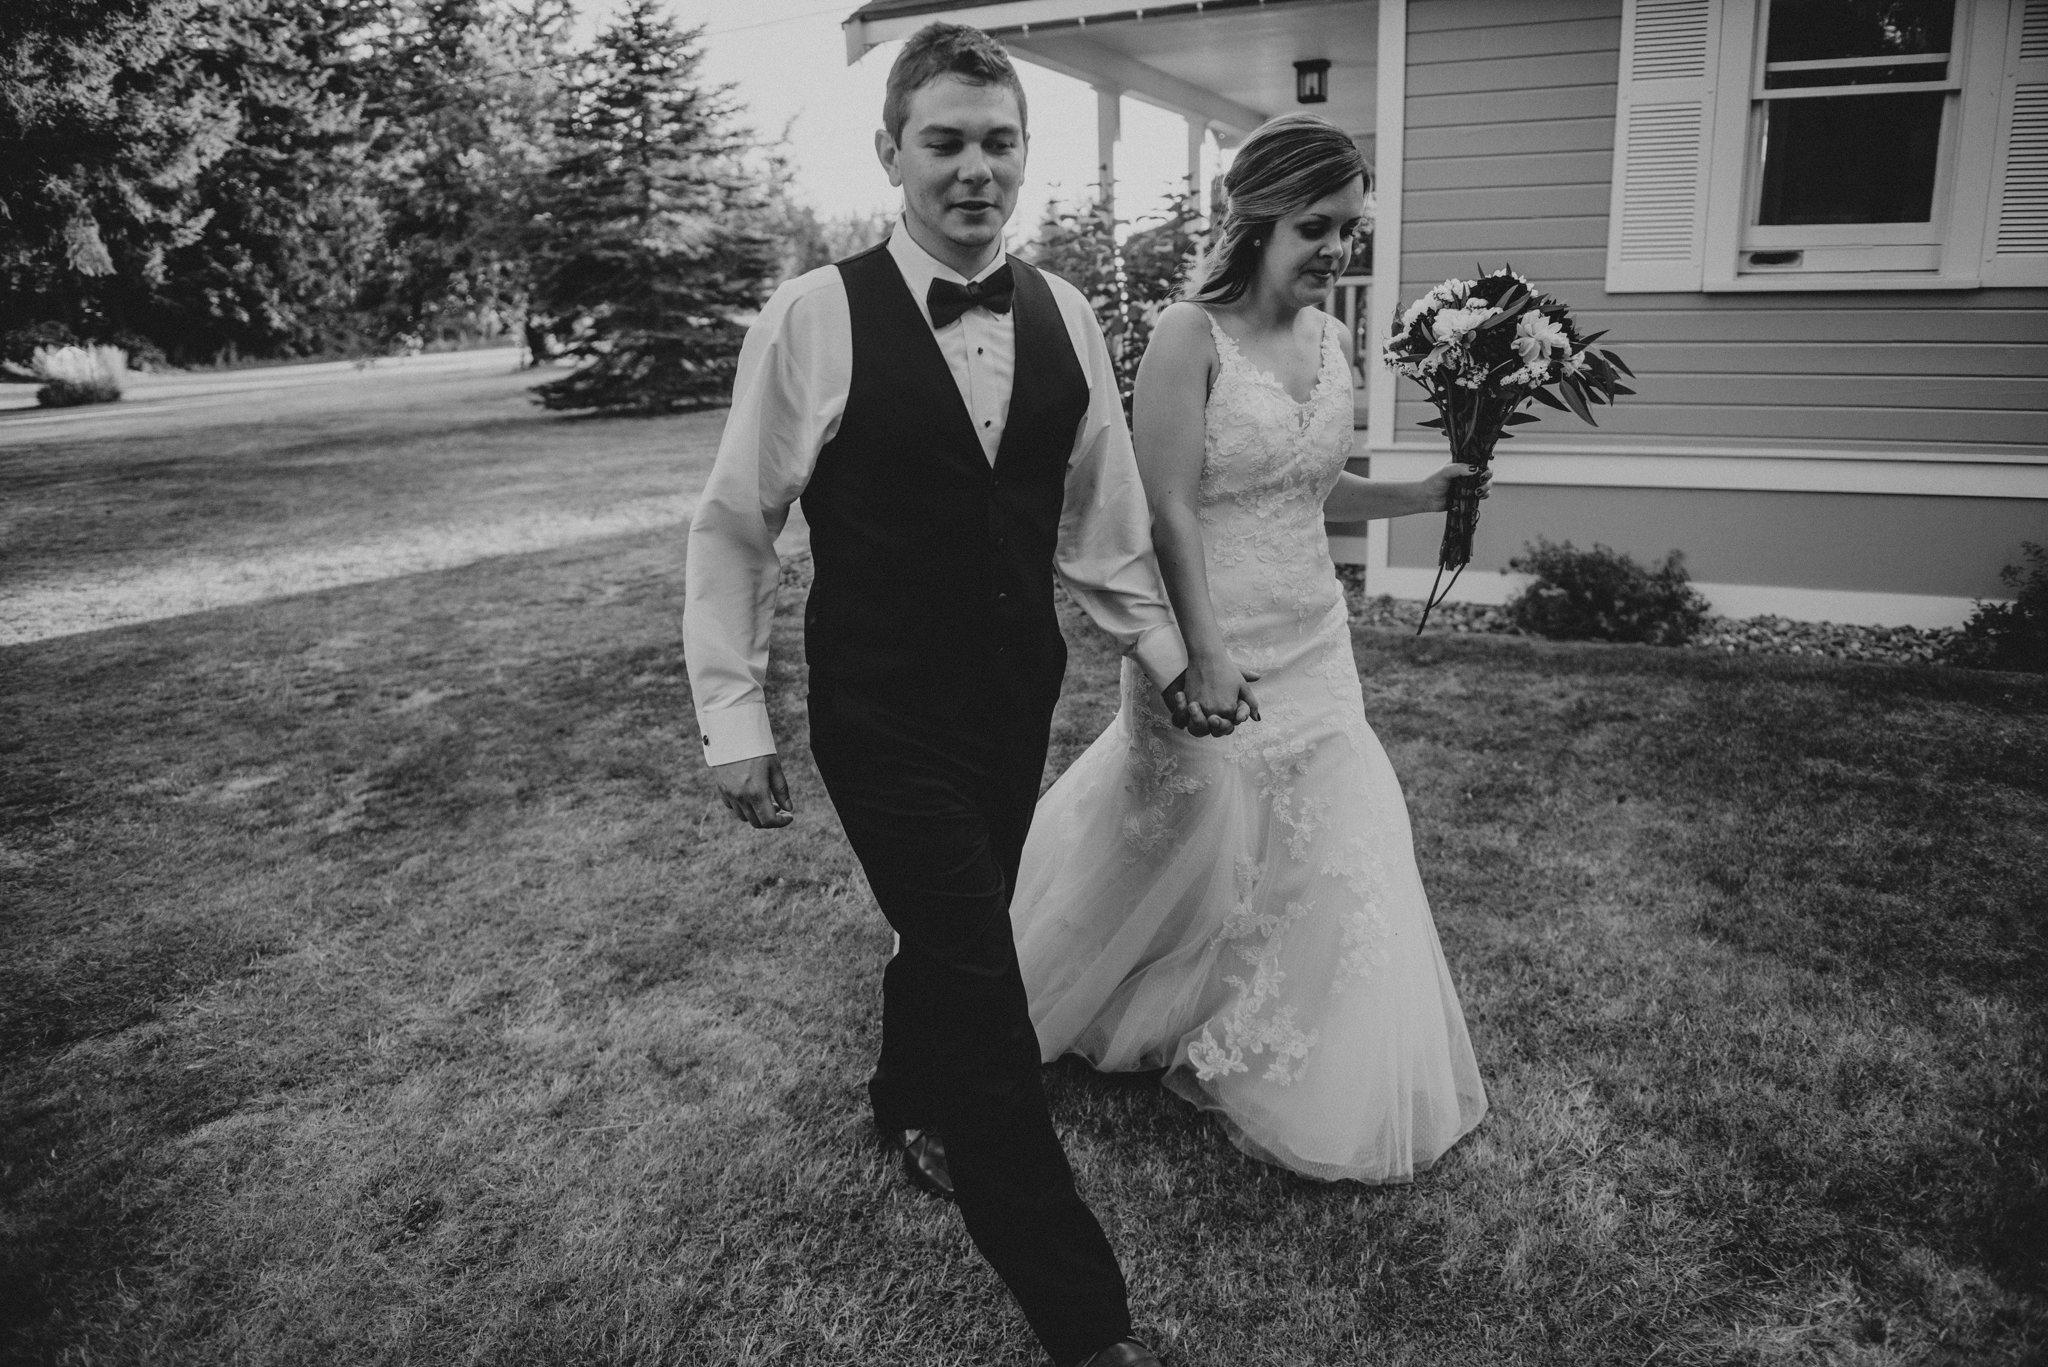 kristen-and-cody-the-kelley-farm-wedding-seattle-photographer-caitlyn-nikula-97.jpg